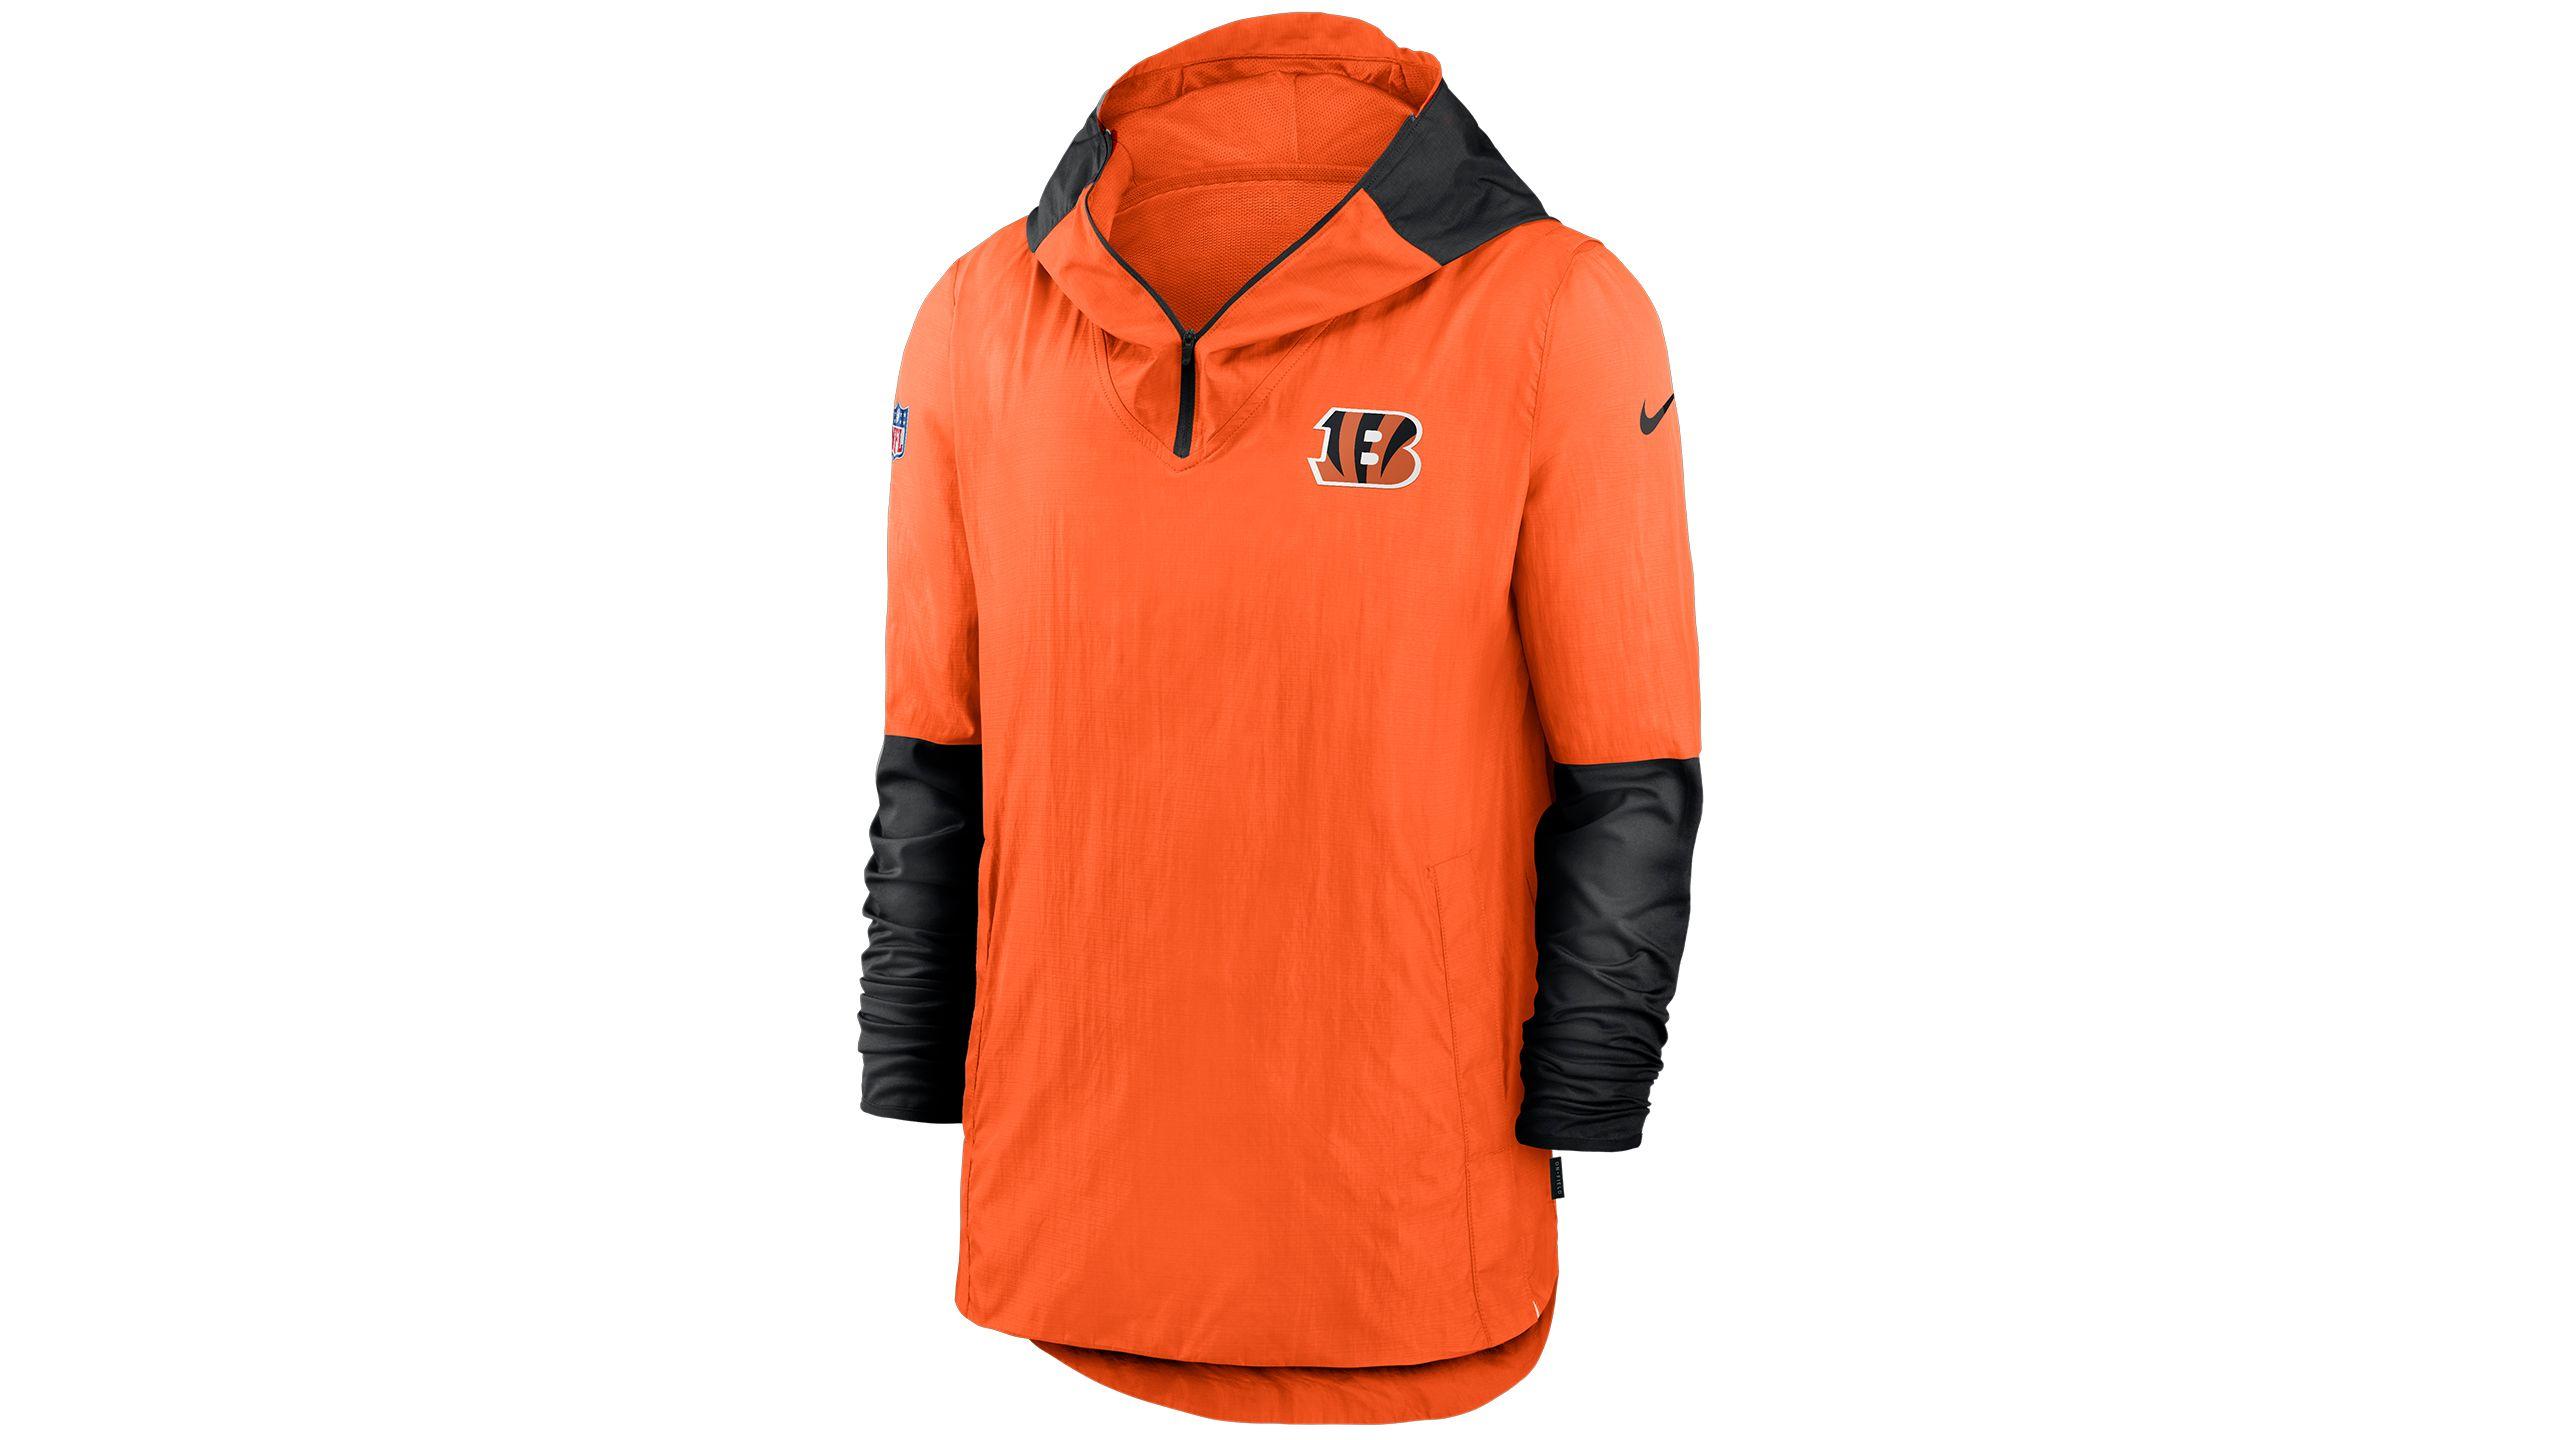 Nike Player Jacket 20